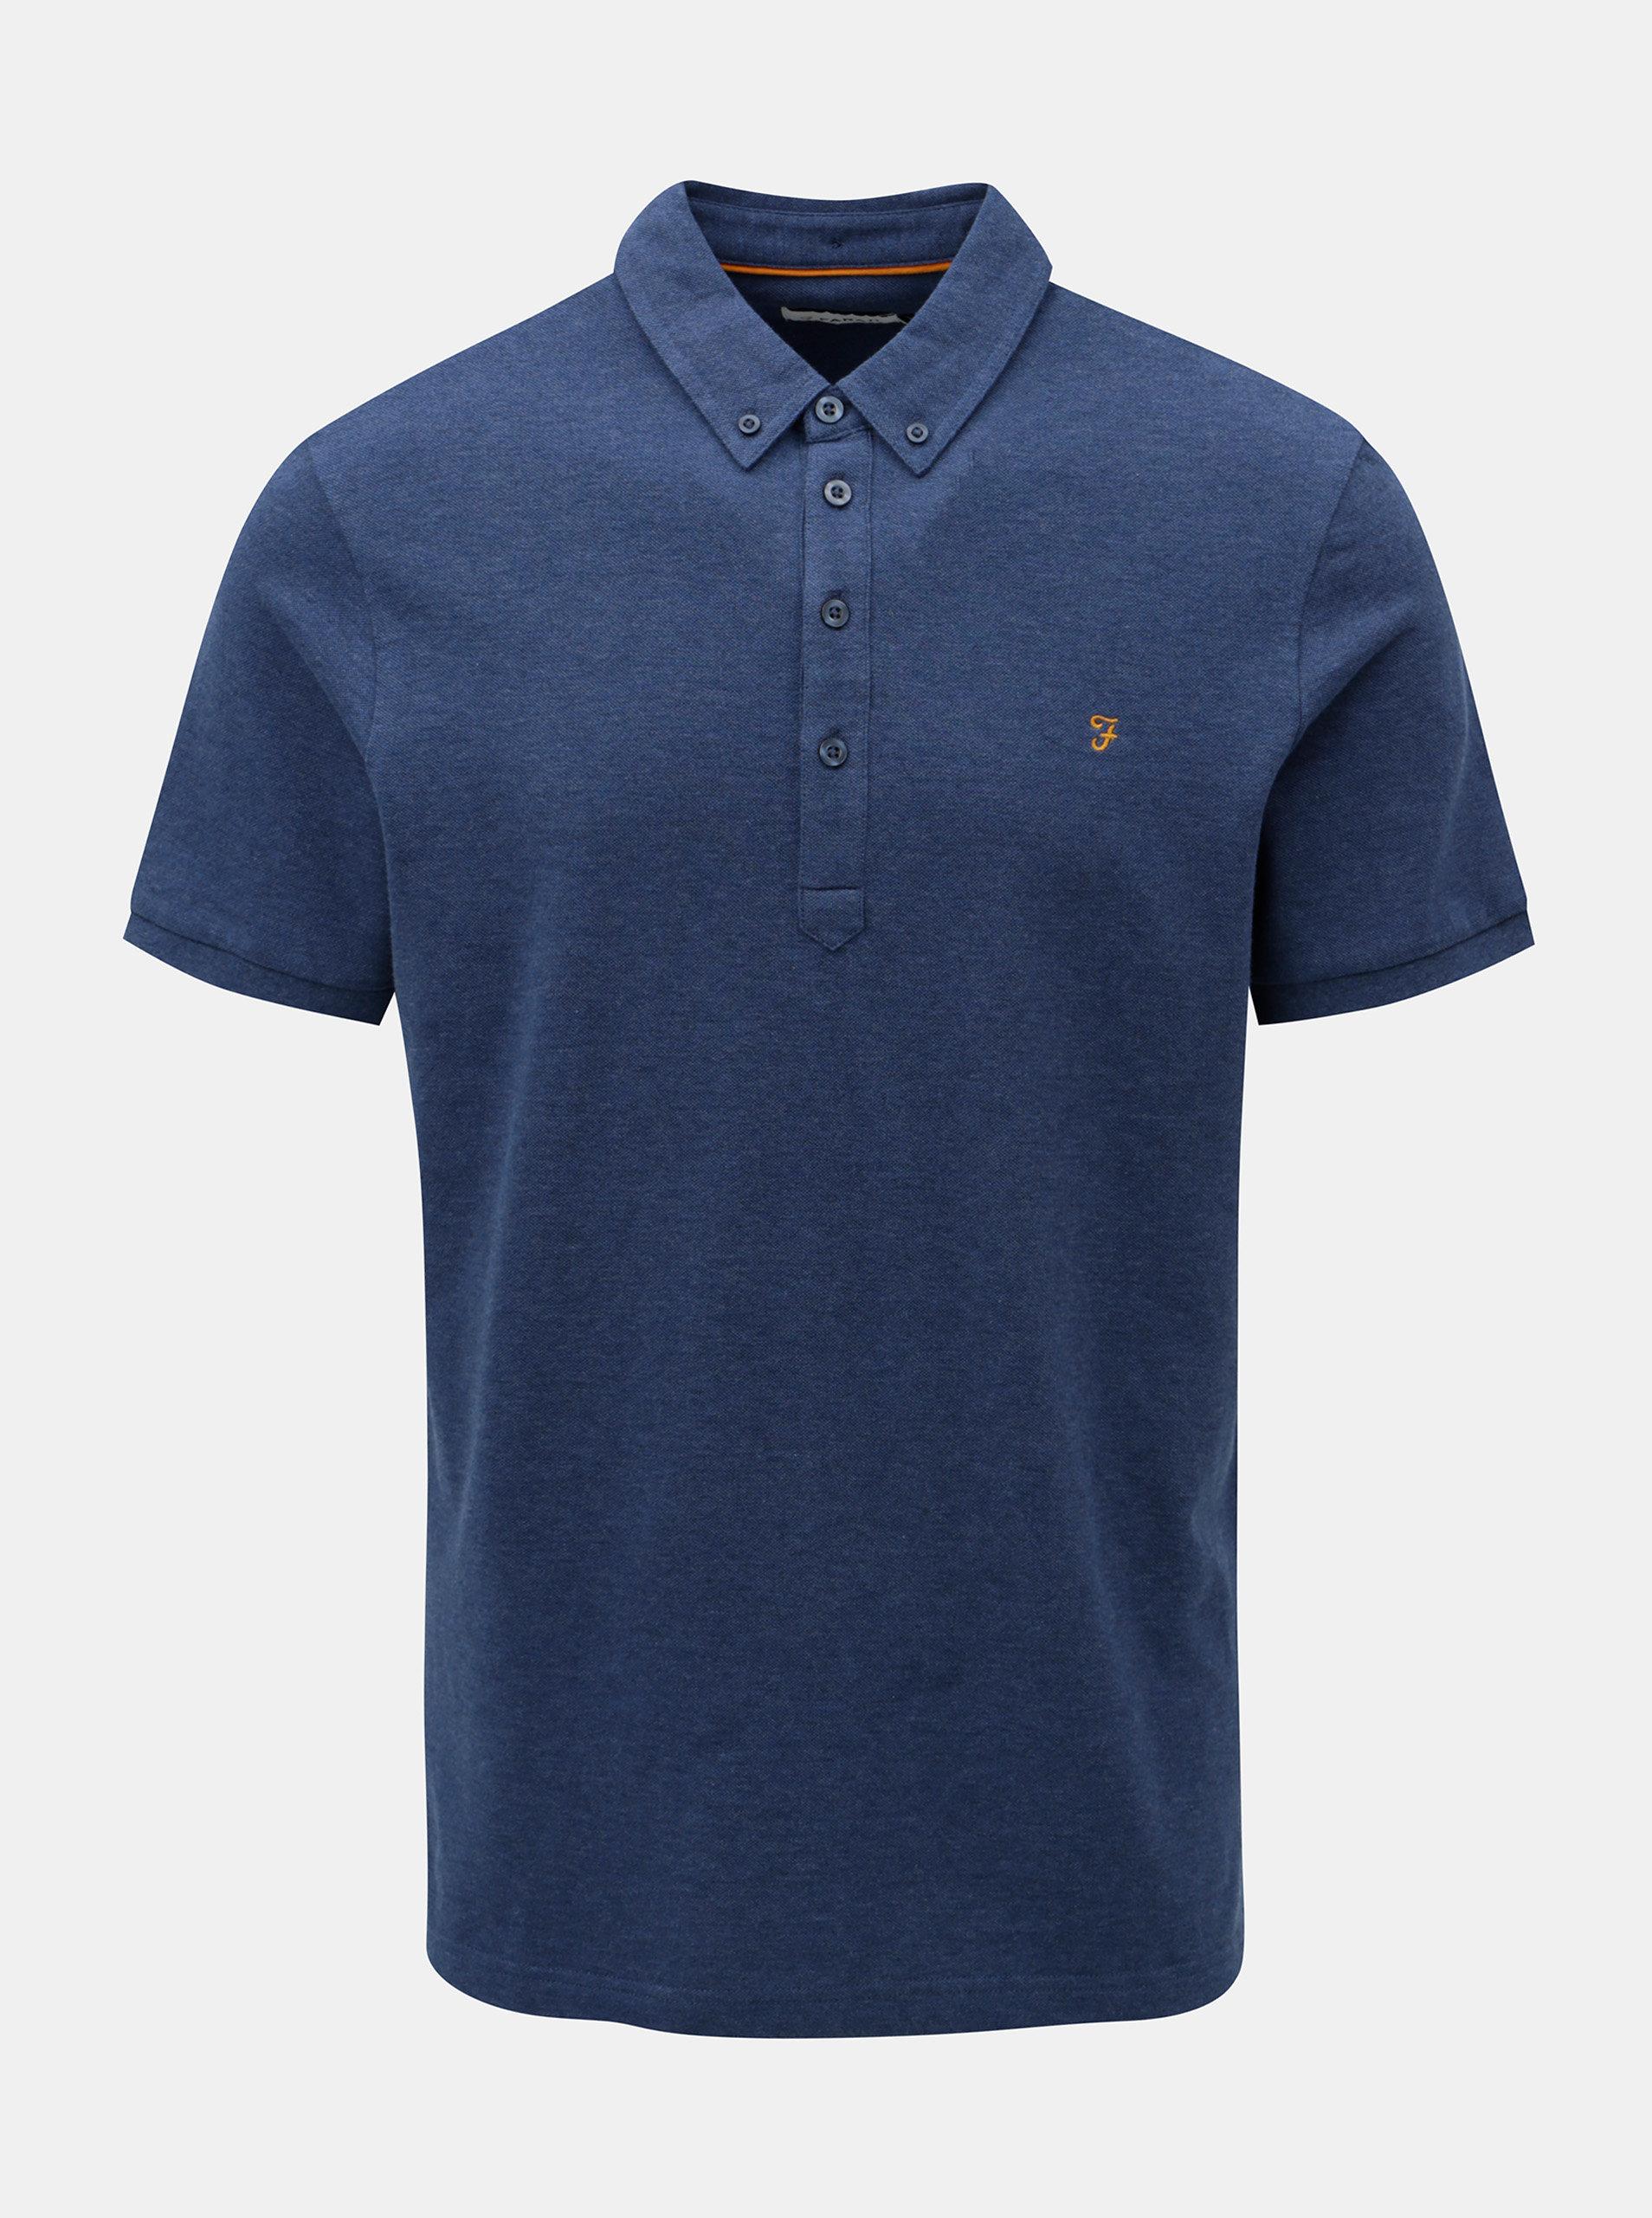 Modré žíhané polo tričko Farah Merriweather